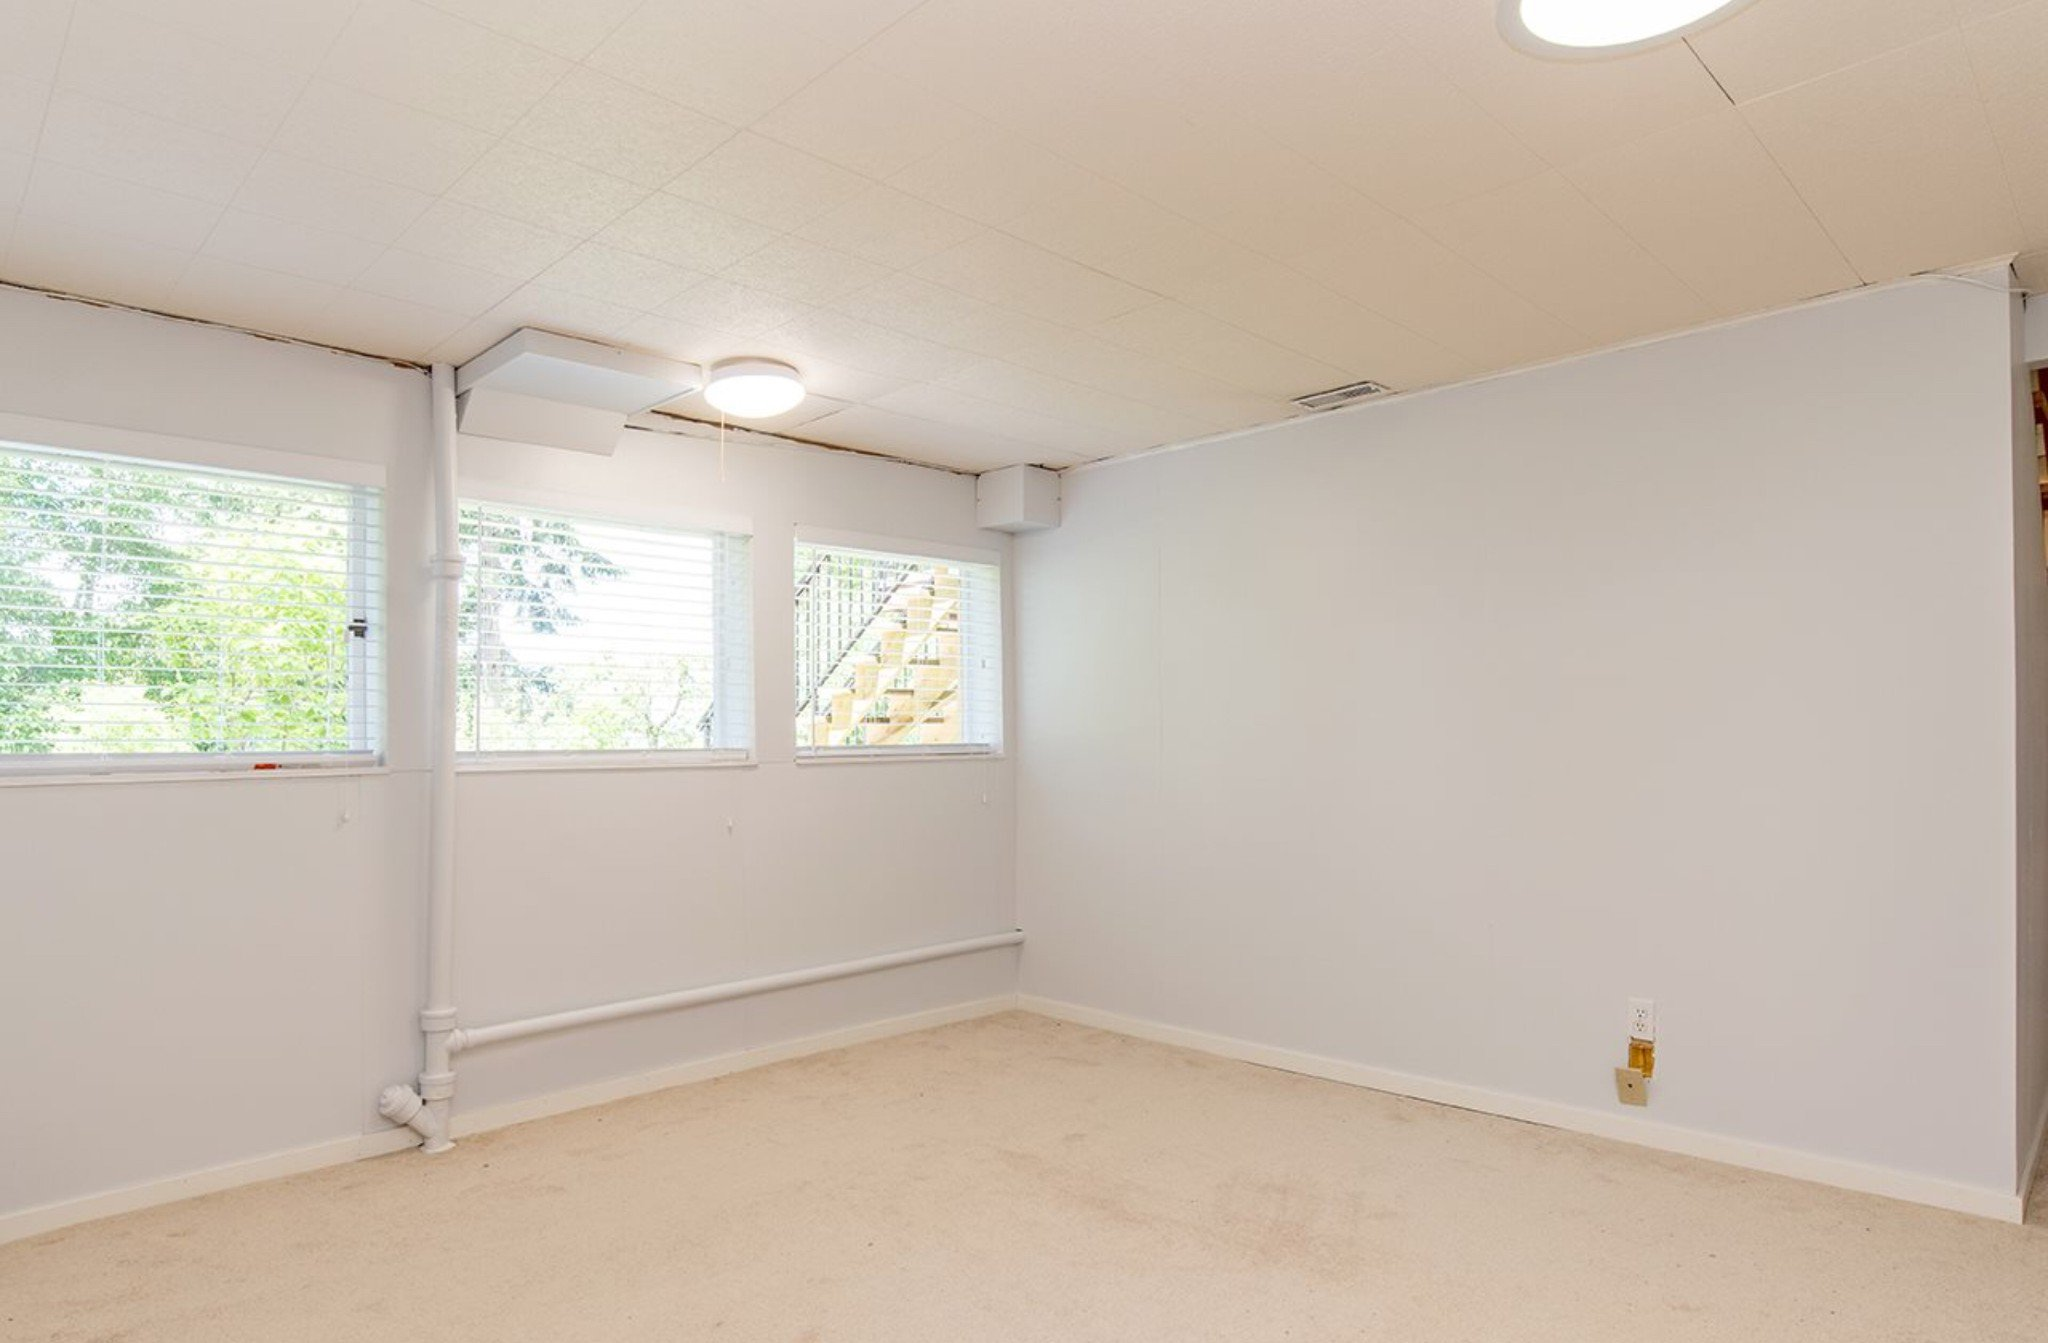 Photo 16: Photos: 10327 127A Street in Surrey: Cedar Hills House for sale : MLS®# R2178137